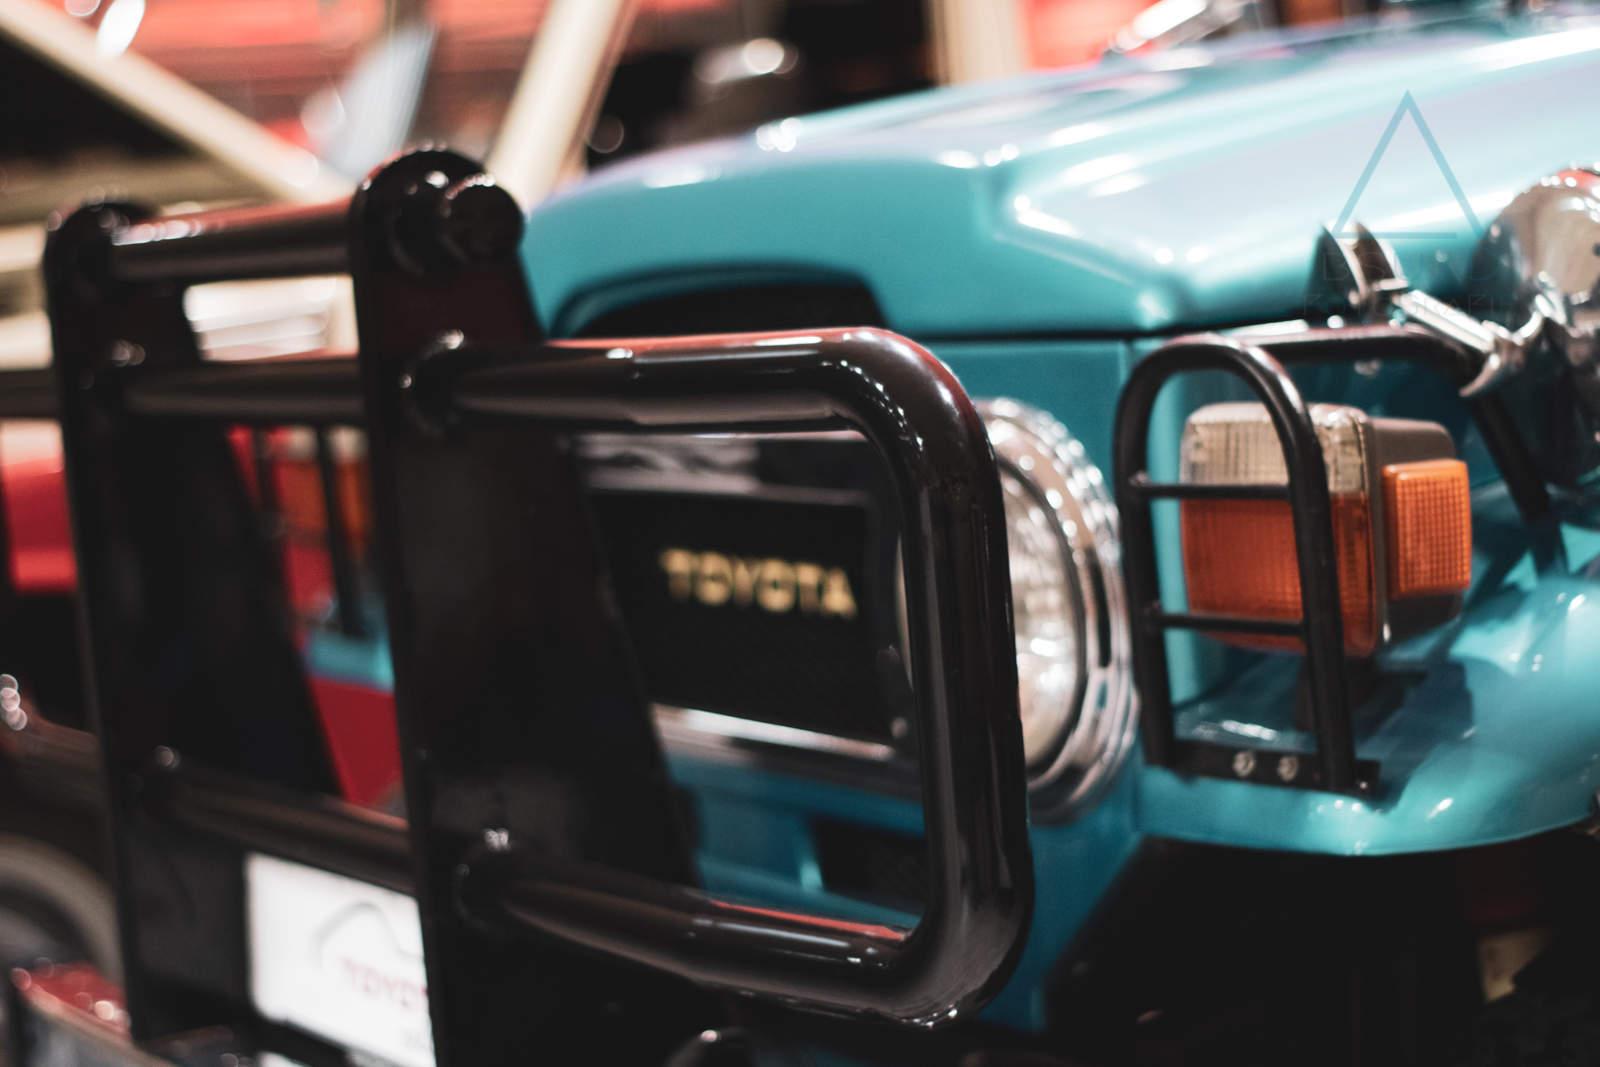 2019-01-05-Toyota-Collection-Koeln - DSC01702-edit-53.jpg